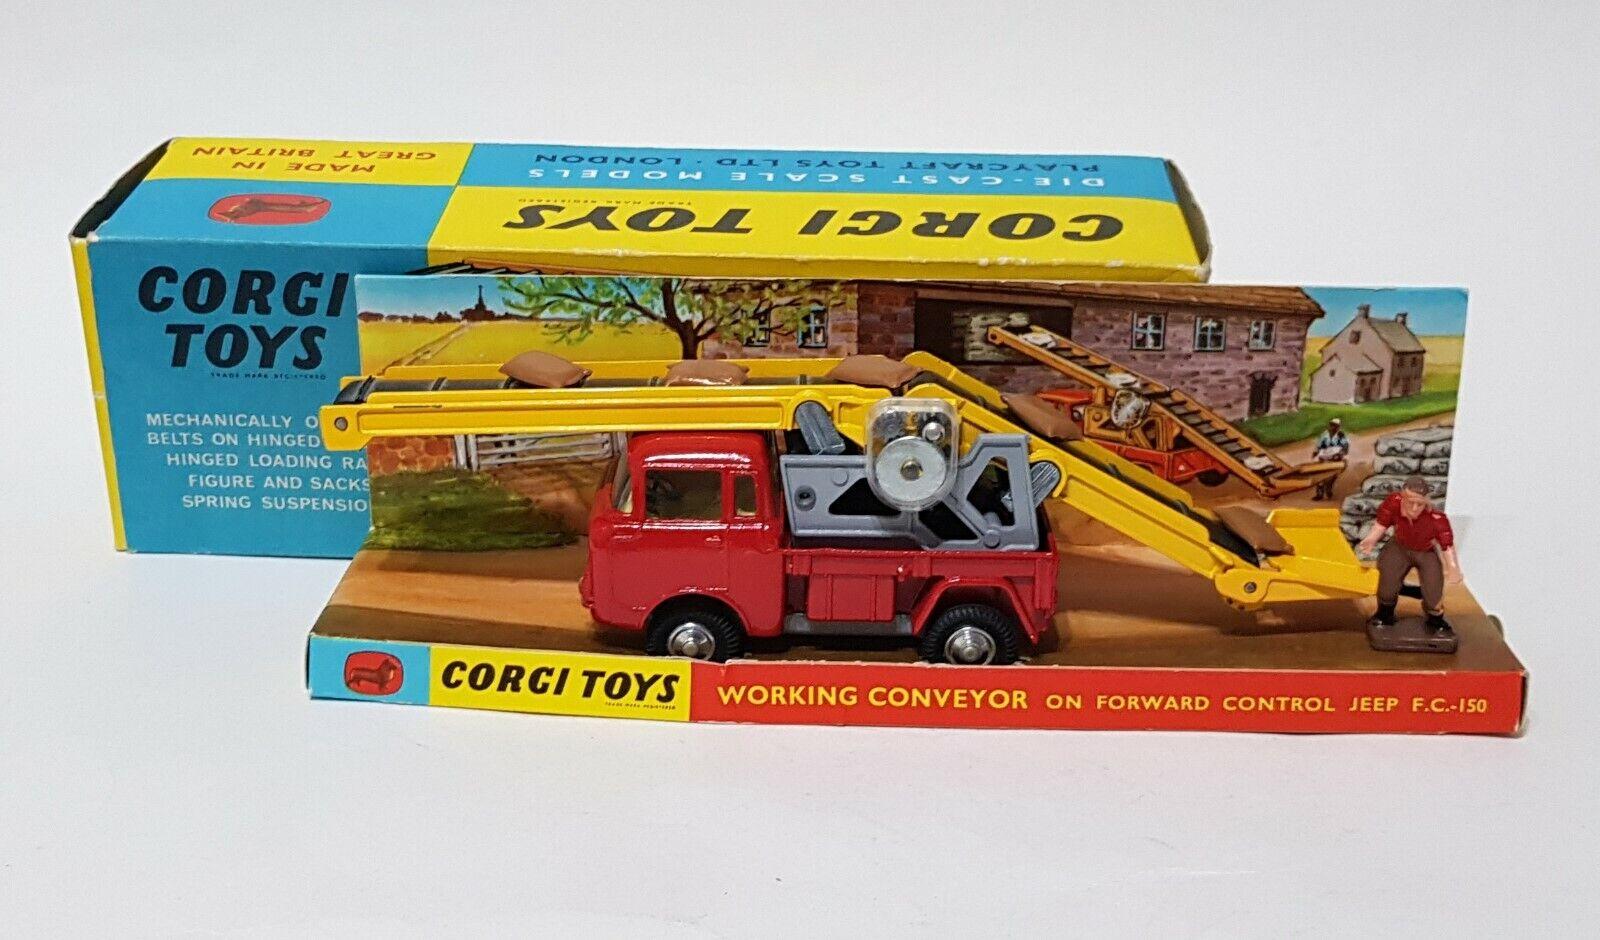 Corgi Toys 64, Working Conveyor on Forward Control Jeep, - Superb mint Condition